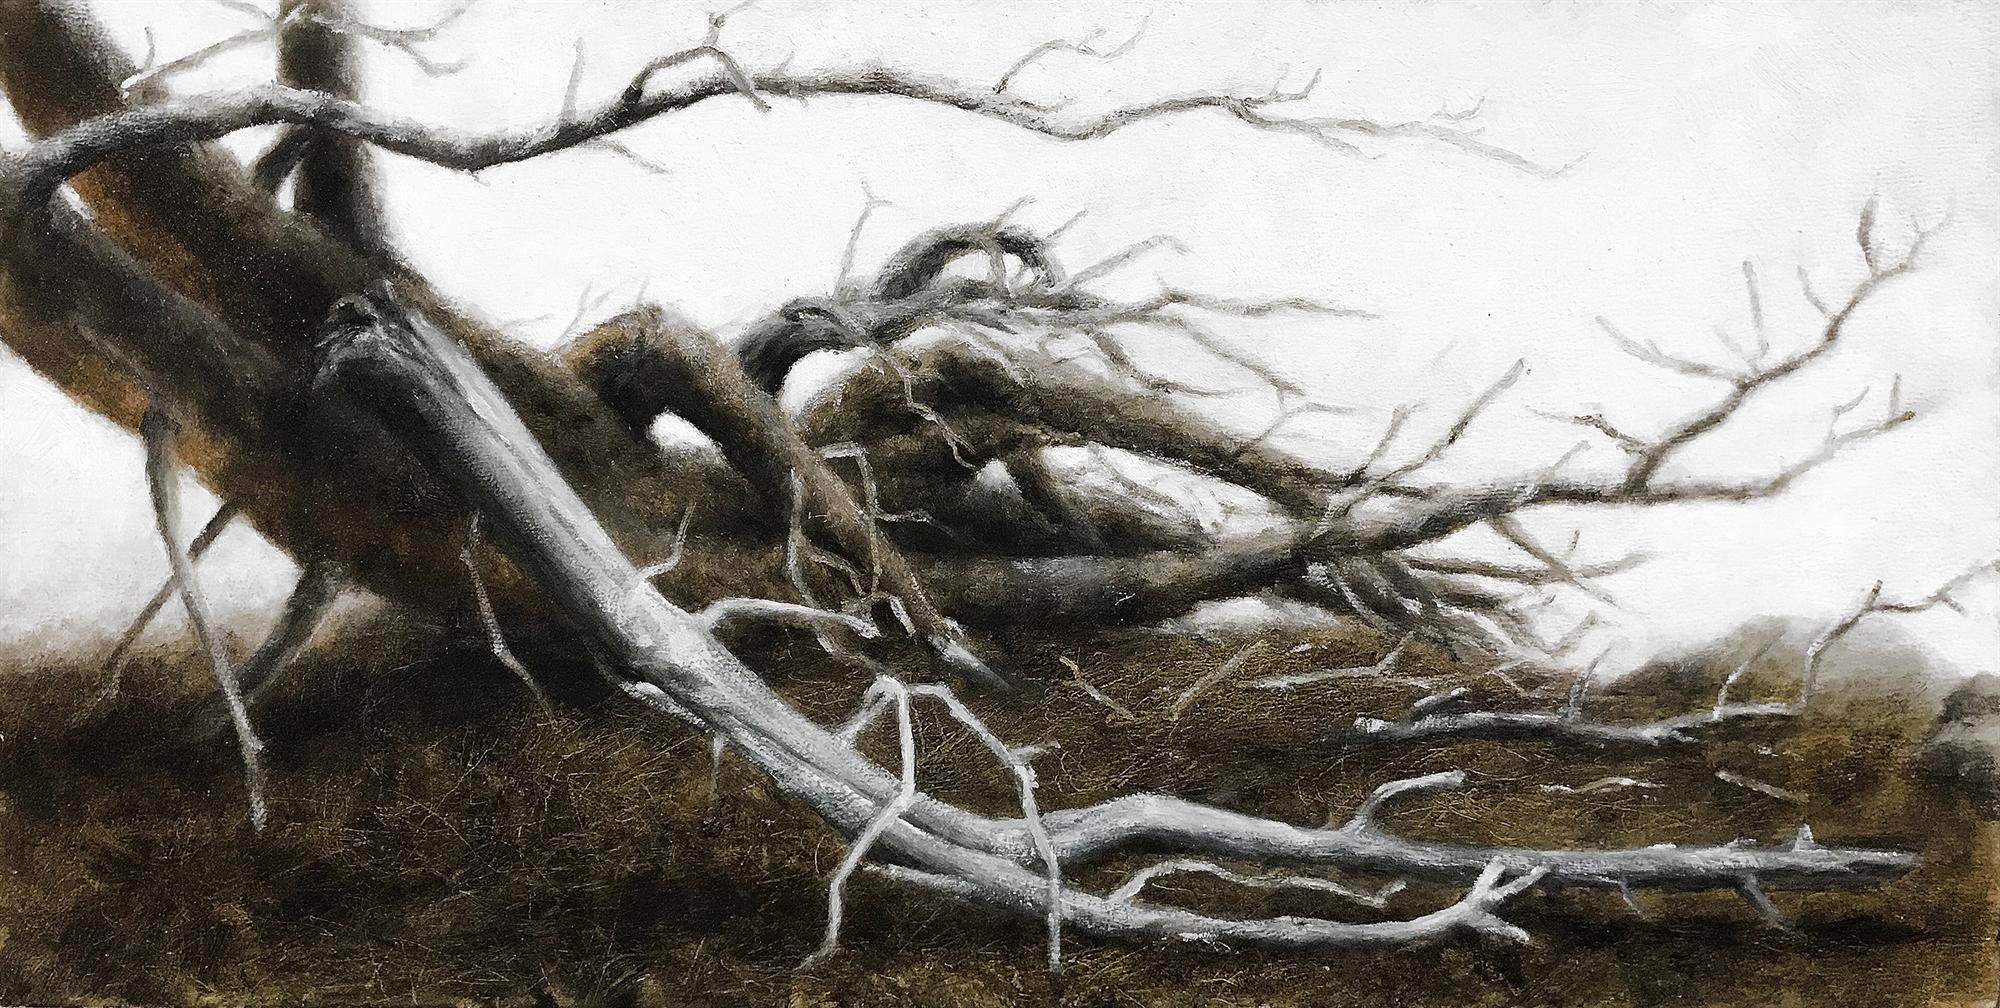 Ponderosa - Mountain Pine Beetle Outbreak by Lisa Lebofsky